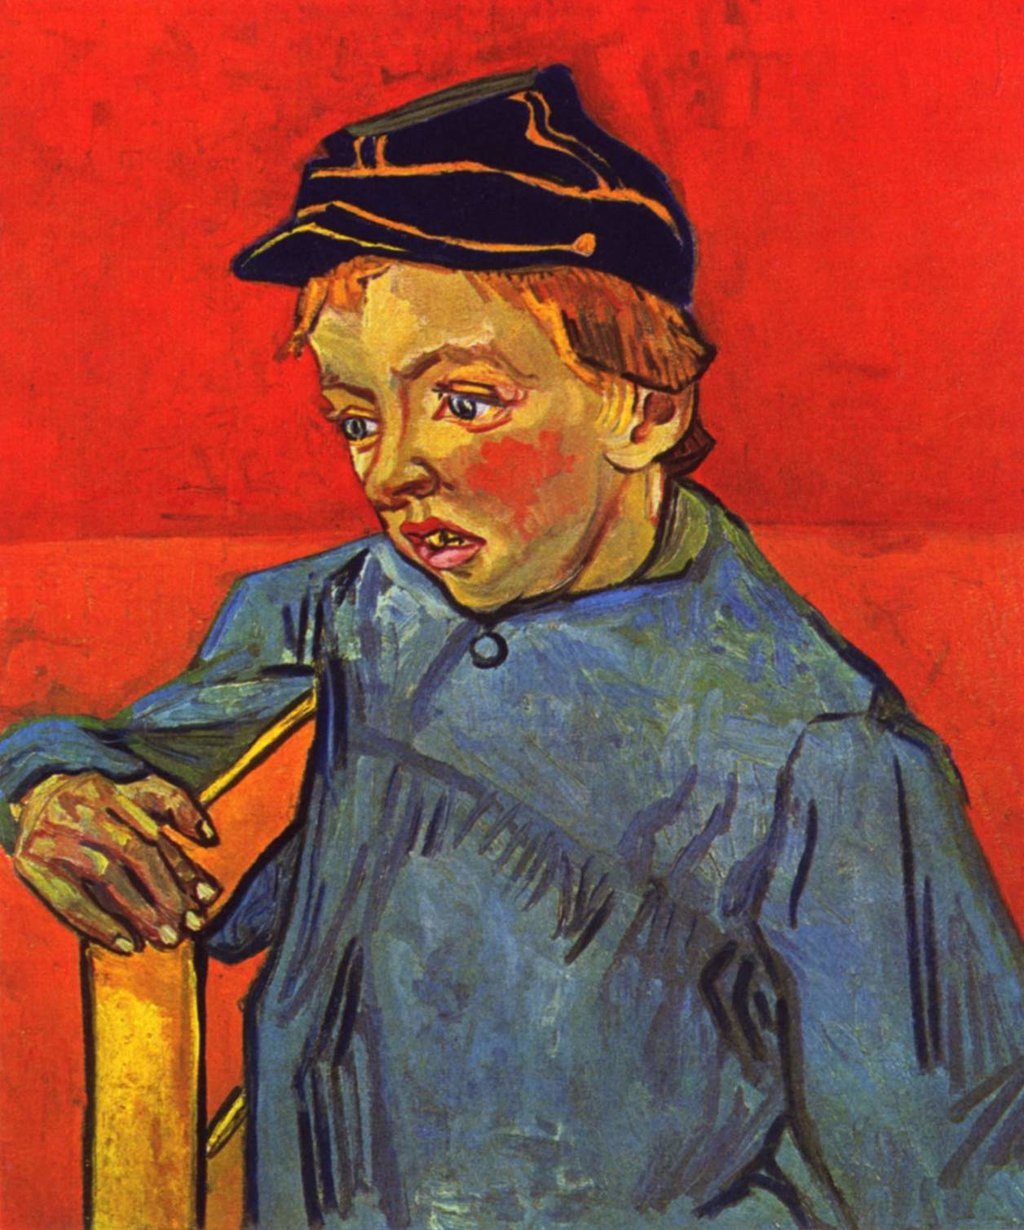 Vincent_Willem_van_Gogh_100.jpg?1557408734